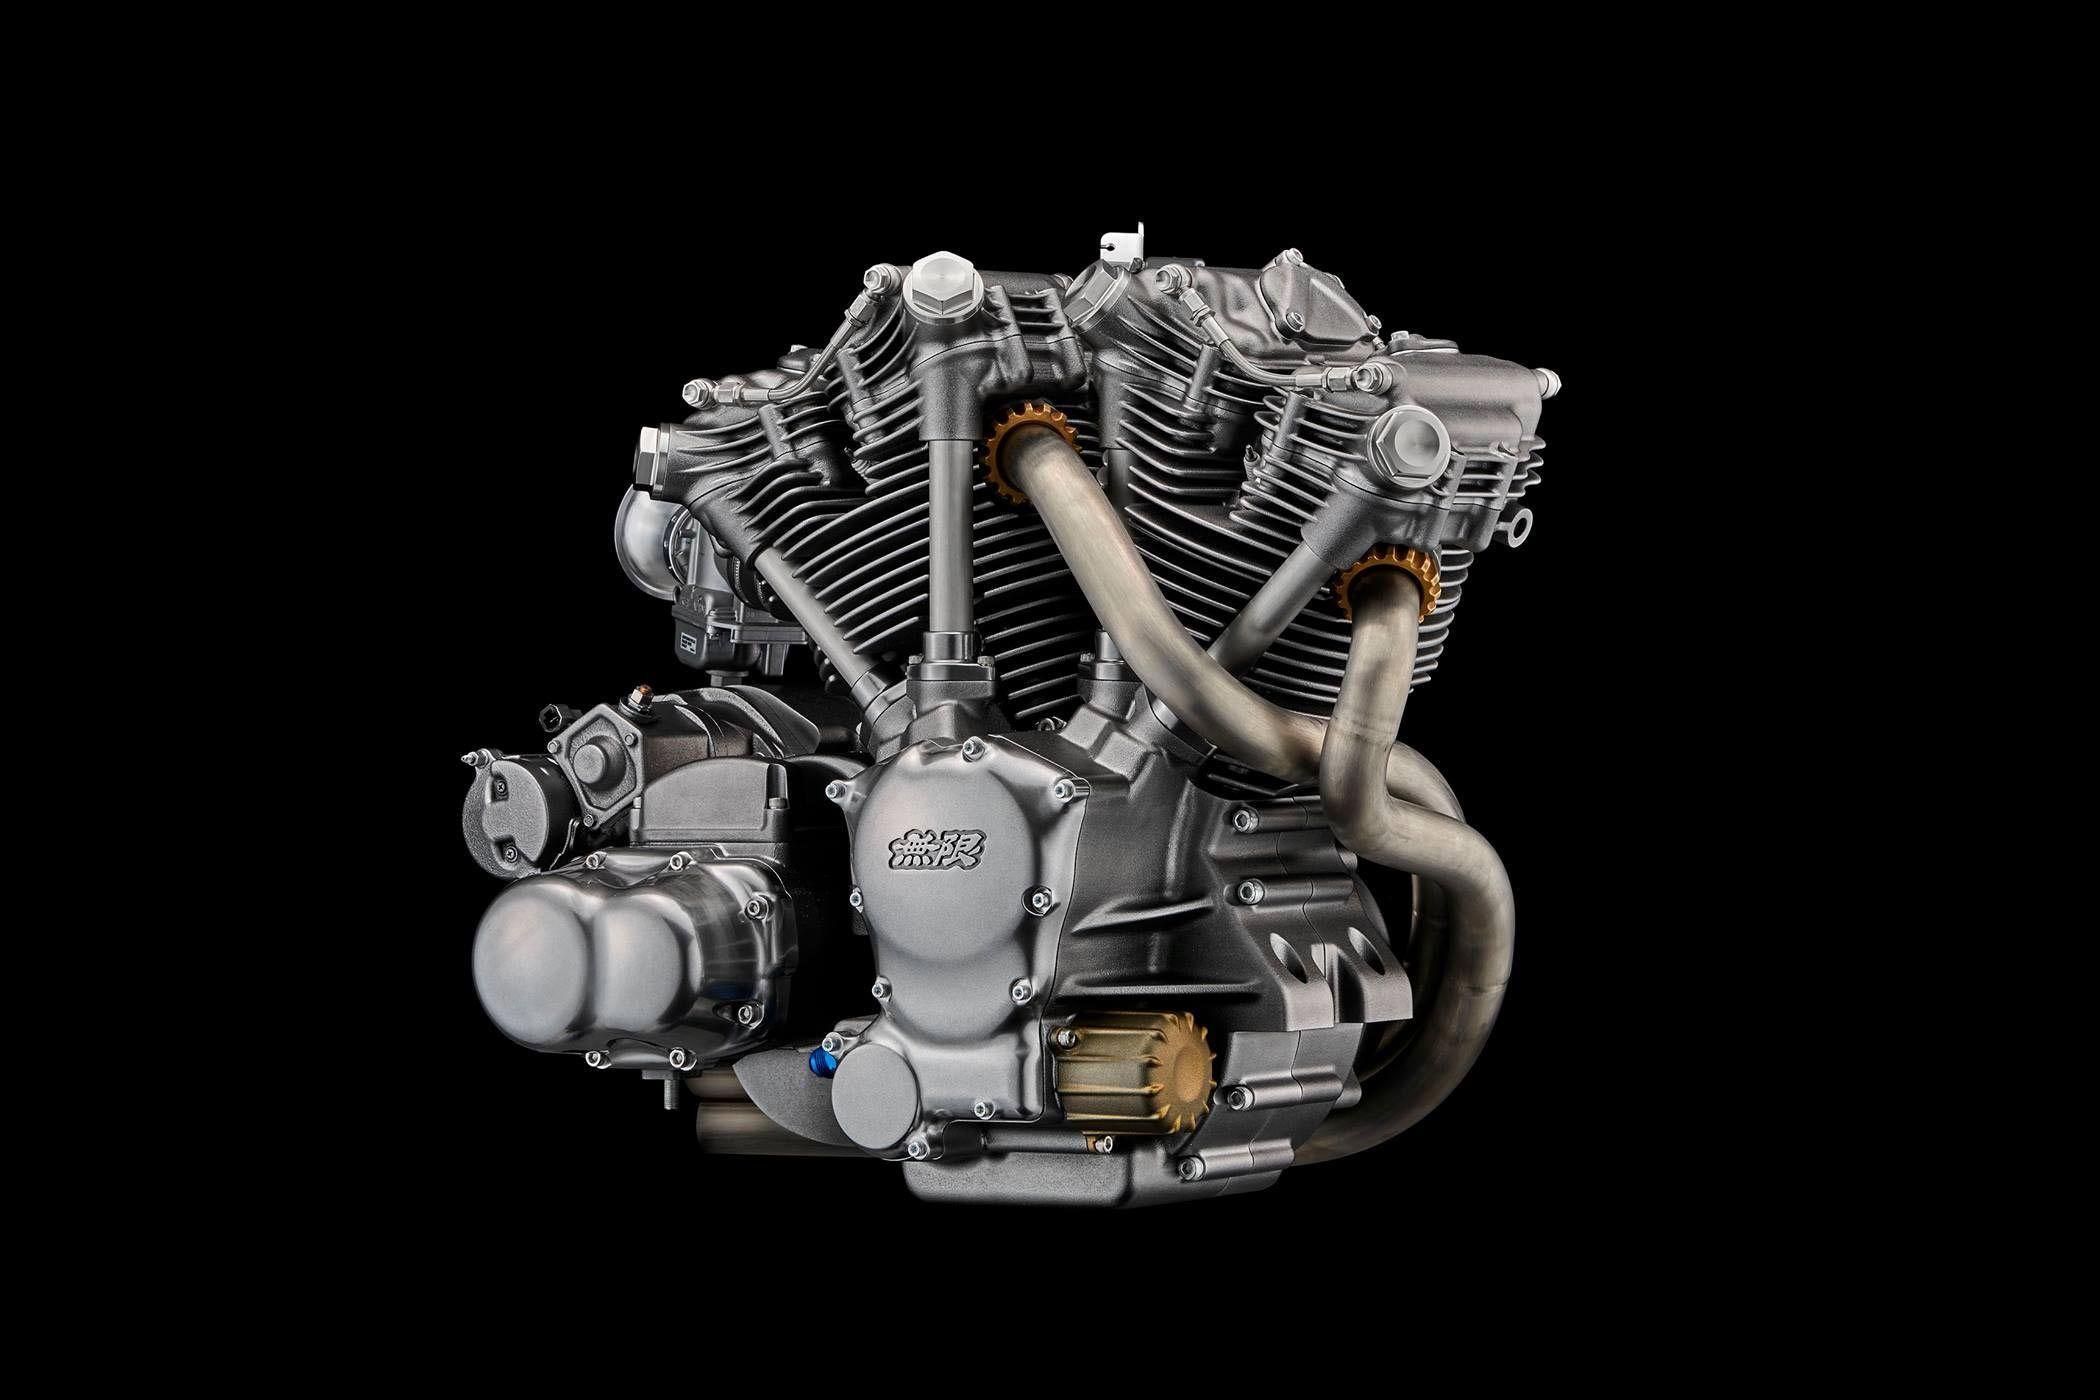 Мотоциклы с двигателем V Twin